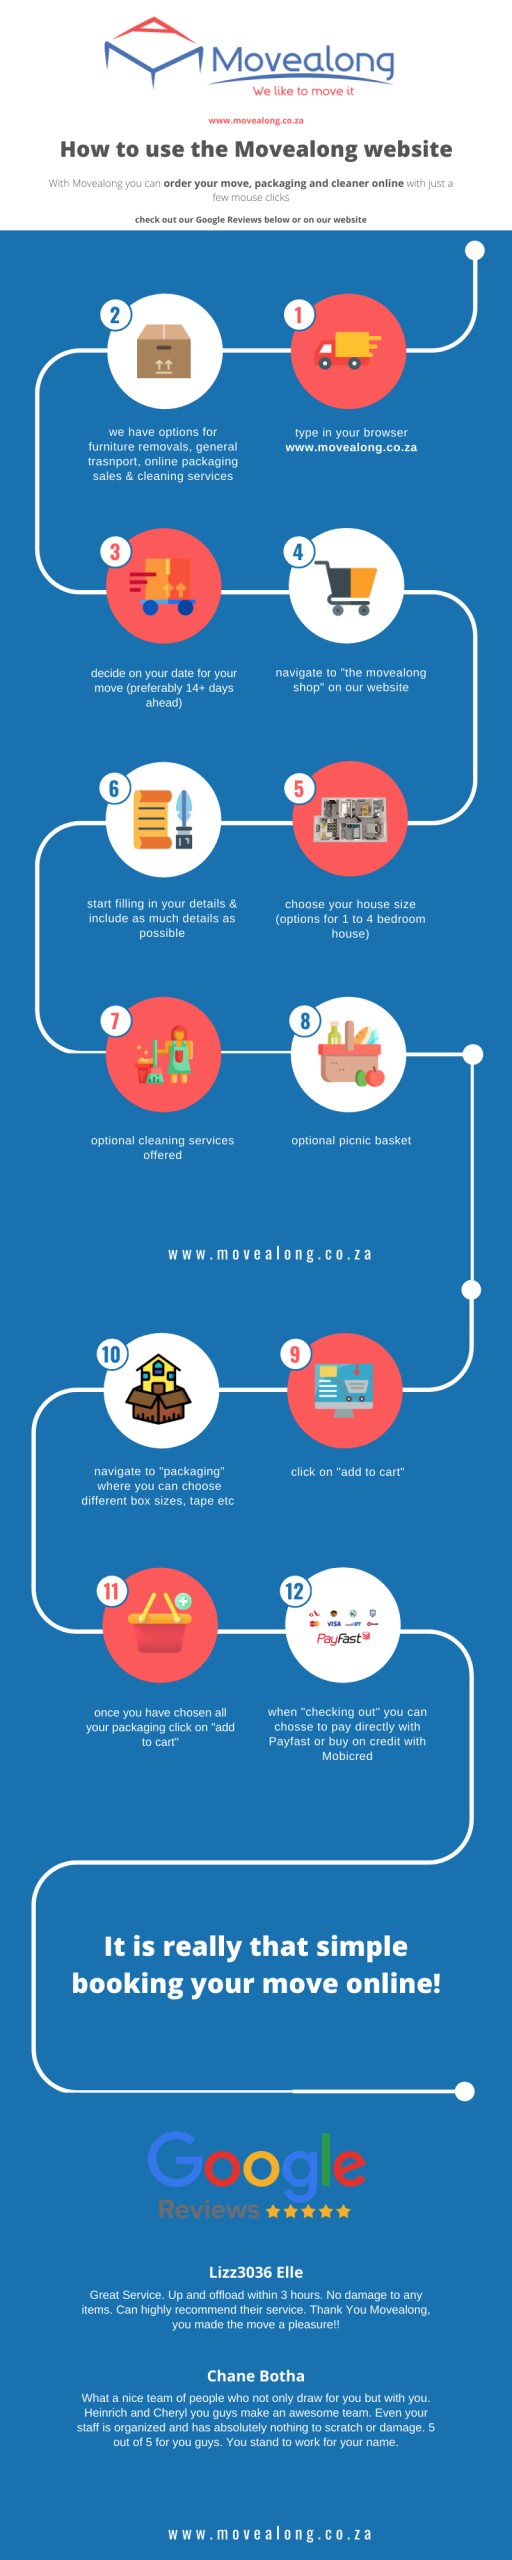 MLG Infographic 2